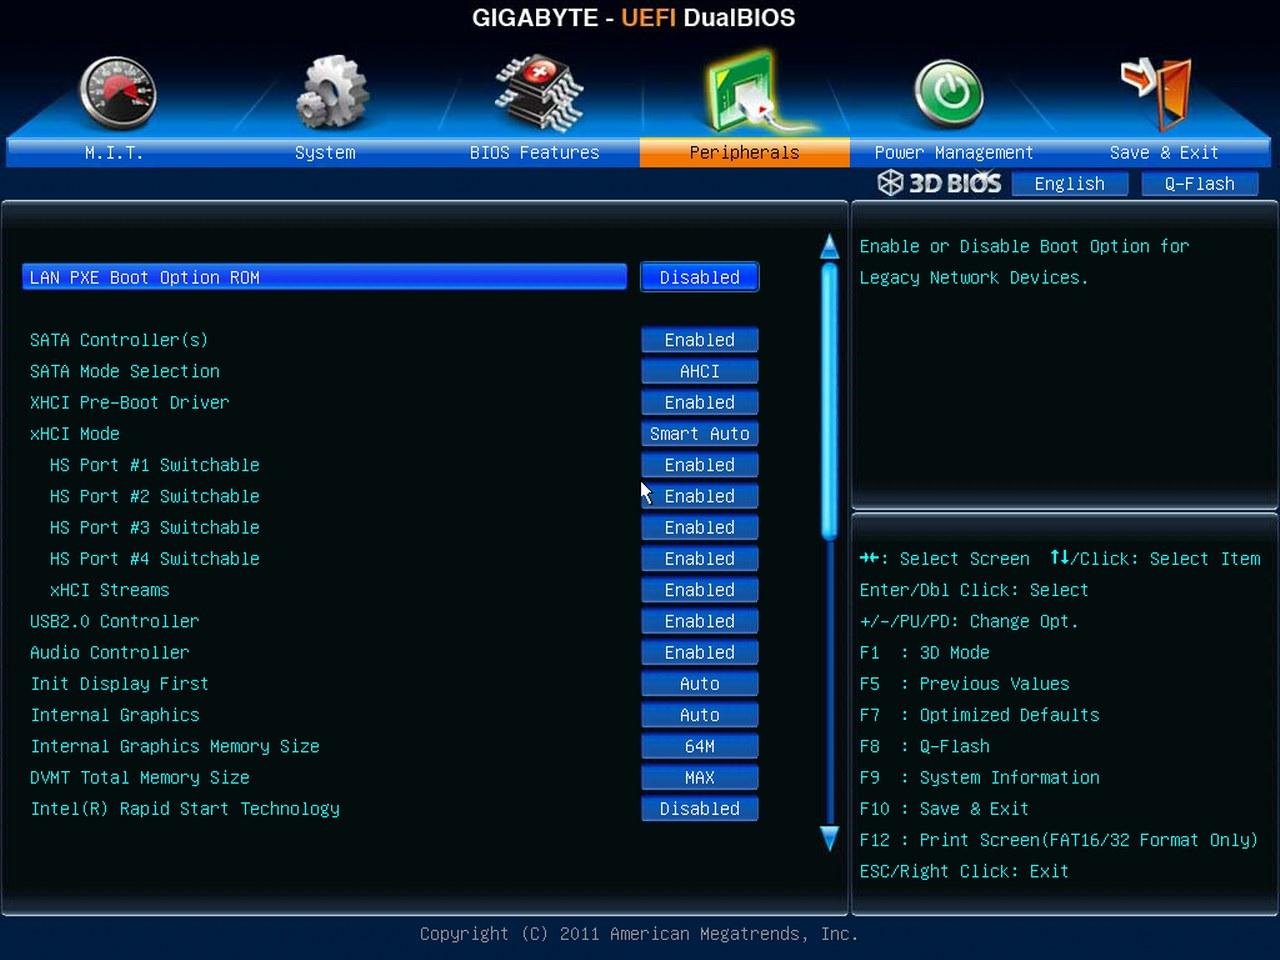 Gigabyte Z77X-UD5H-WB WIFI, BIOS UEFI, peripherals